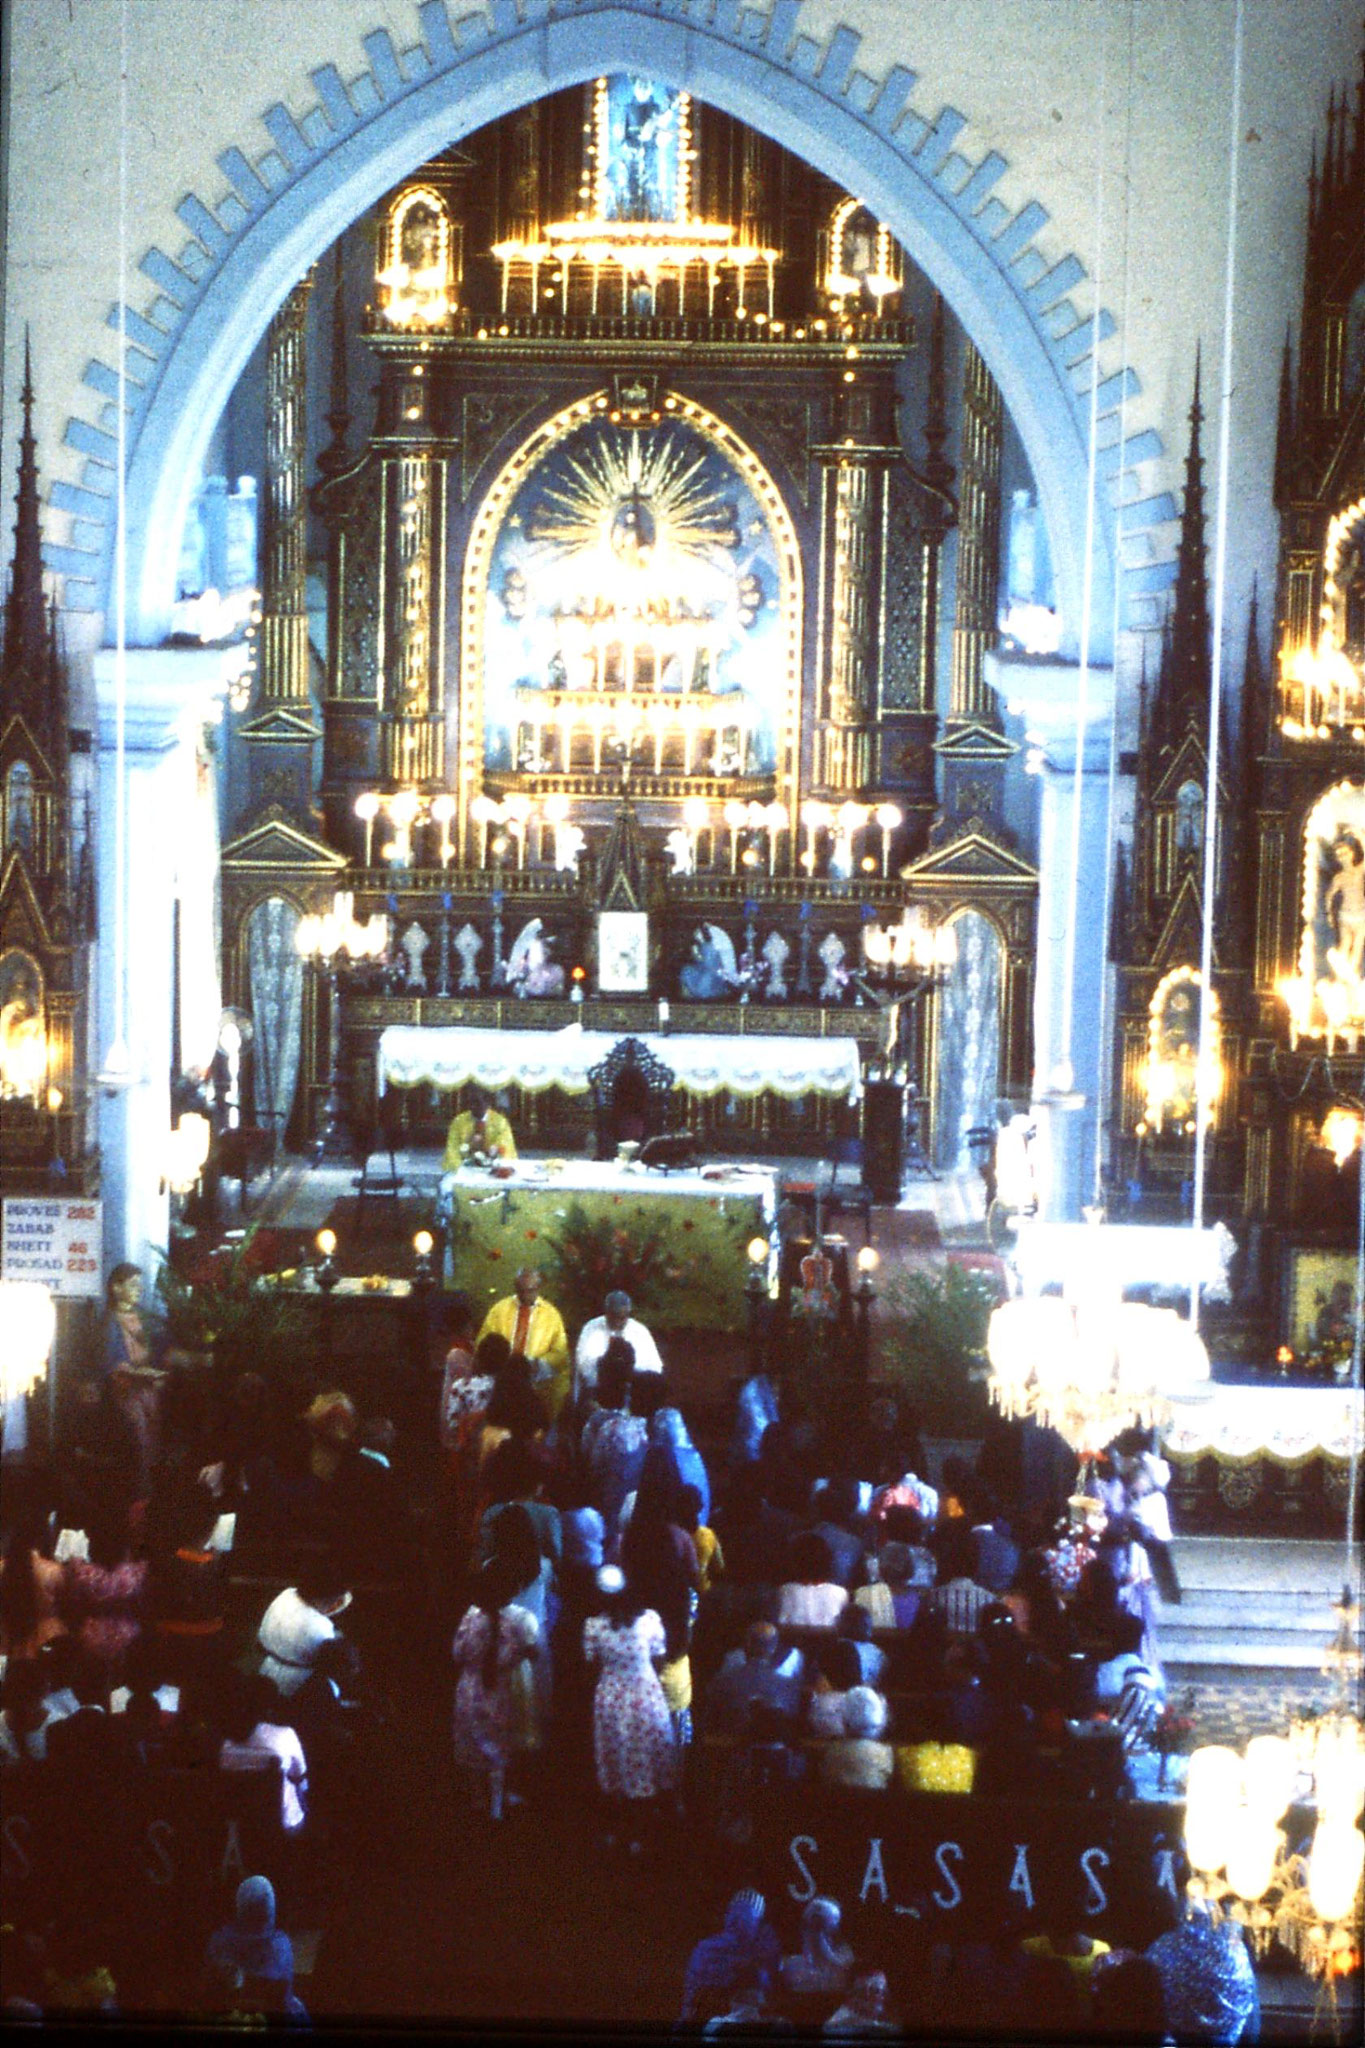 31/12/1989: 11: Siolim church and 10.30 mass